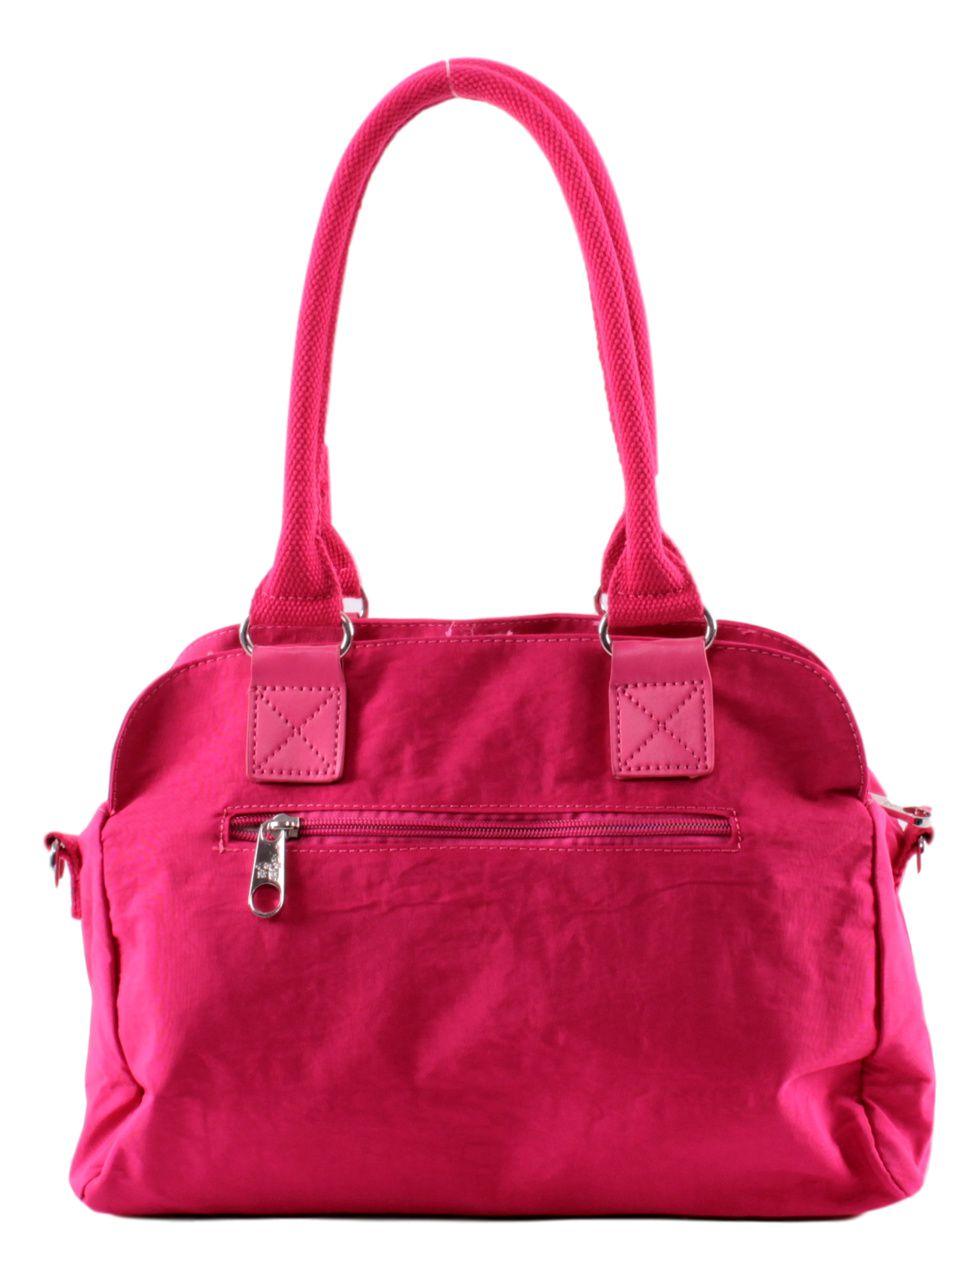 Bolsa Feminina em Nylon HT6038  - Menino_Menina